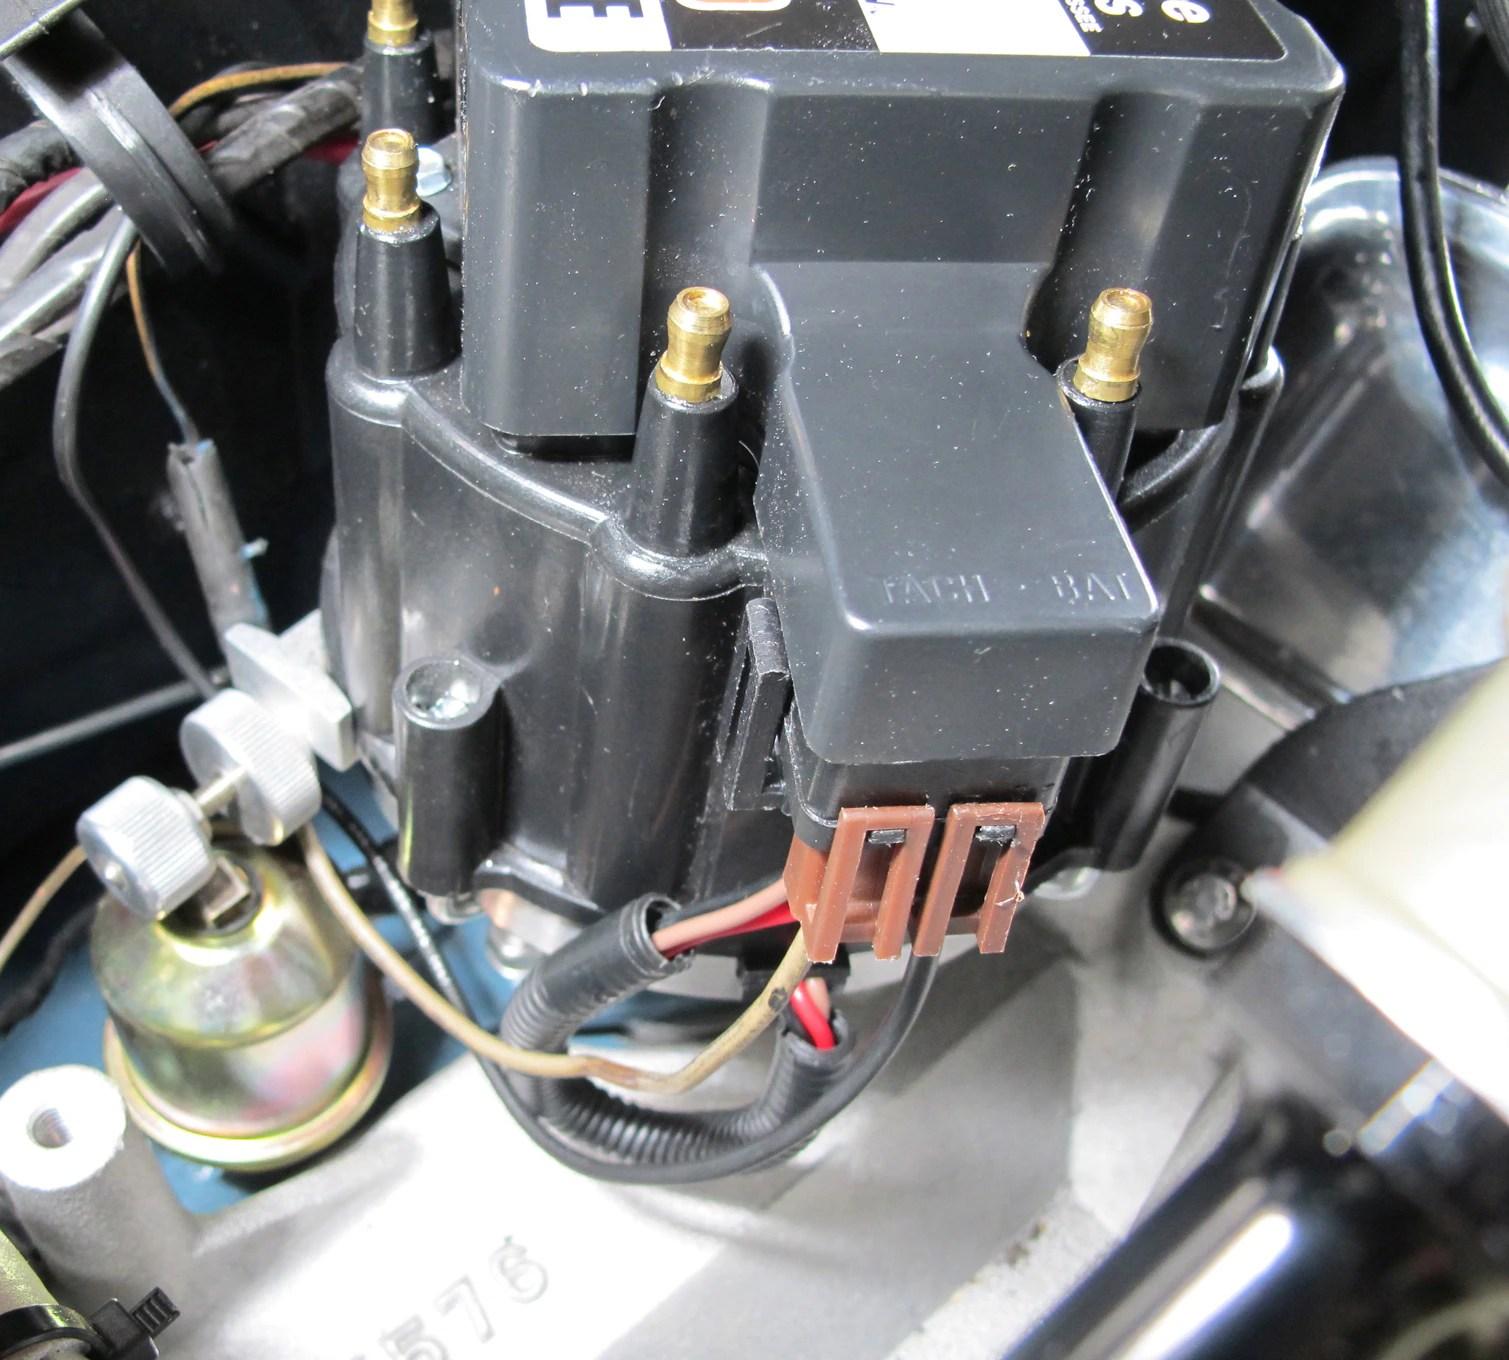 hight resolution of mopar hei wiring diagram help mopar electronic ignition installhei wiring harness hei image wiring diagram is